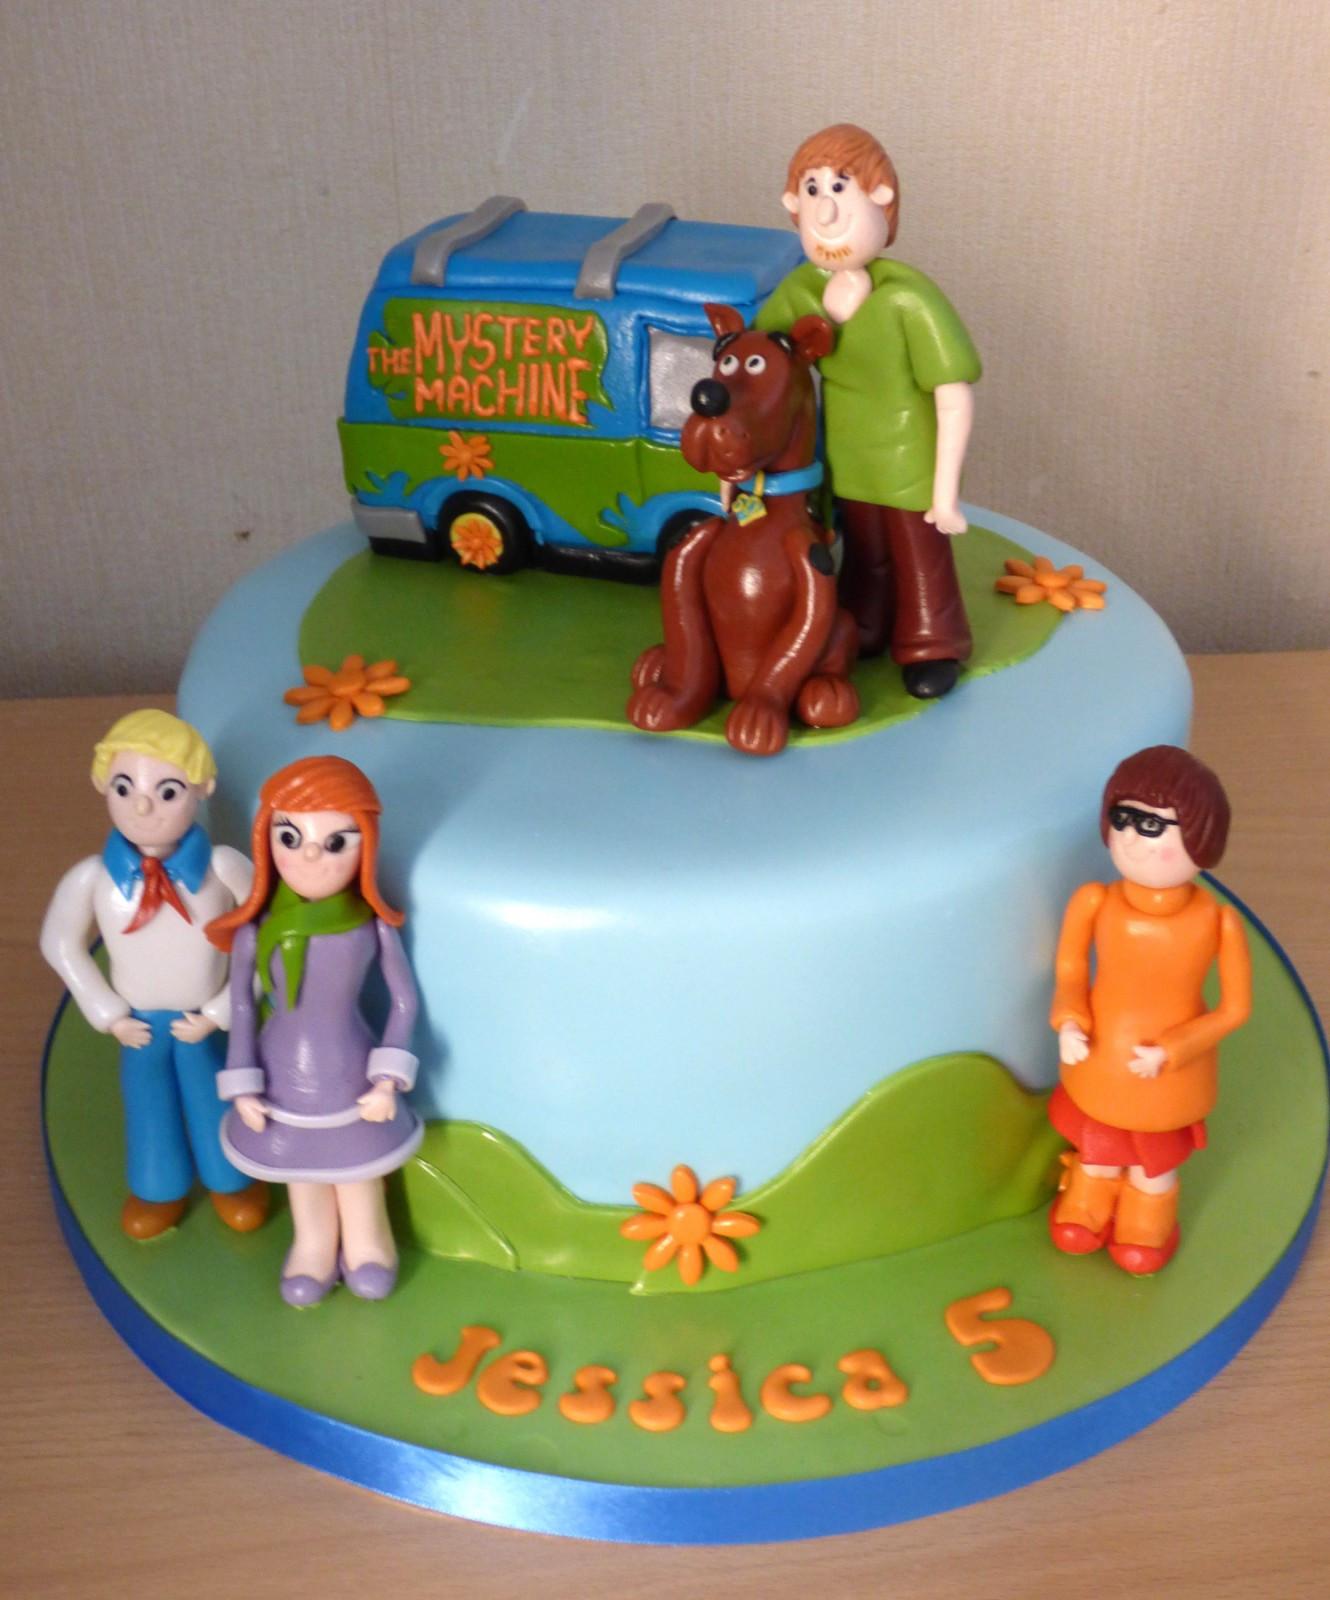 Scooby Doo Birthday Cakes  Scooby Doo and Friends Birthday Cake Susie s Cakes